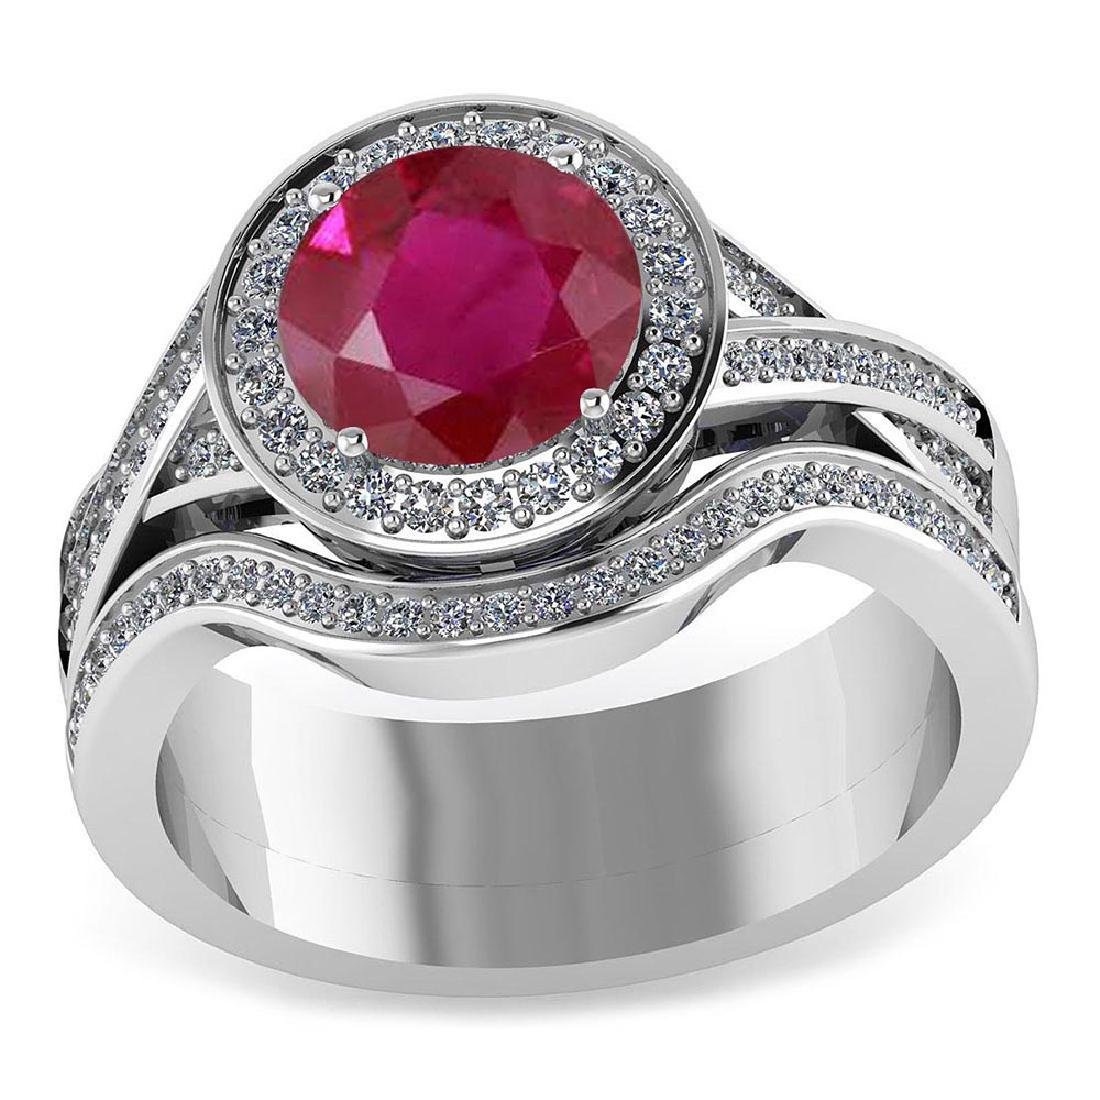 Certified 1.95 CTW Genuine Ruby And Diamond 14K White G